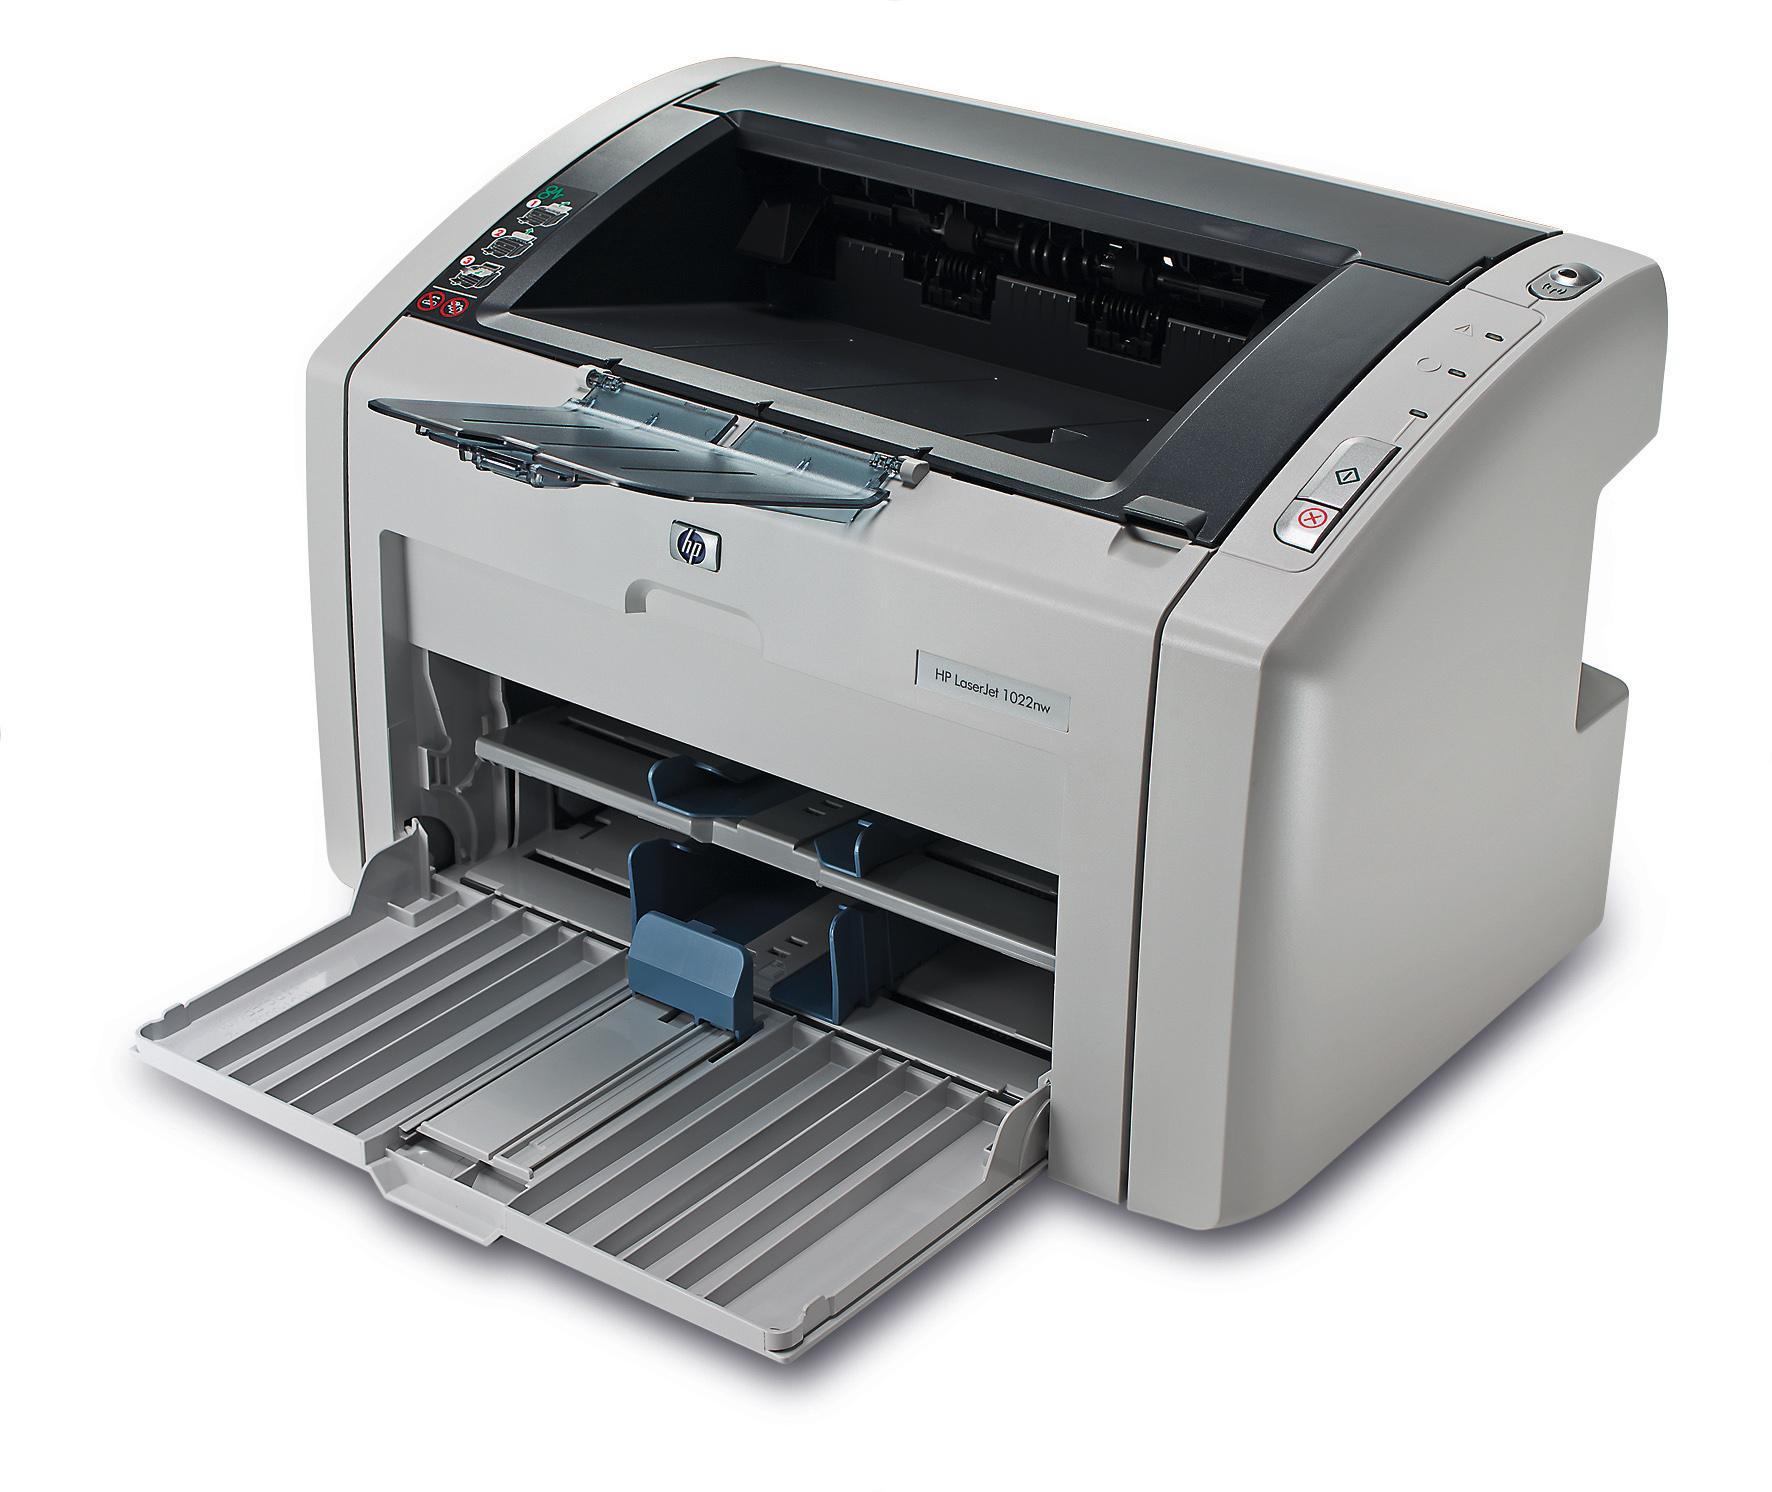 hp laserjet 1022 printer manual best setting instruction guide u2022 rh ourk9 co HP Color Printer HP Bluetooth Printer